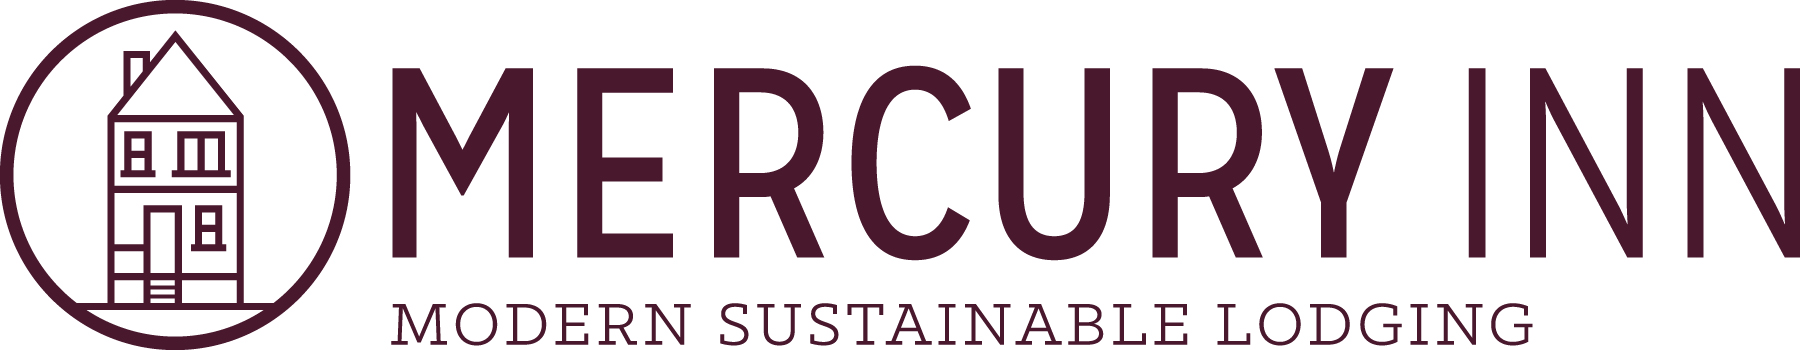 Mercury Inn brand identity and logo by Might & Main